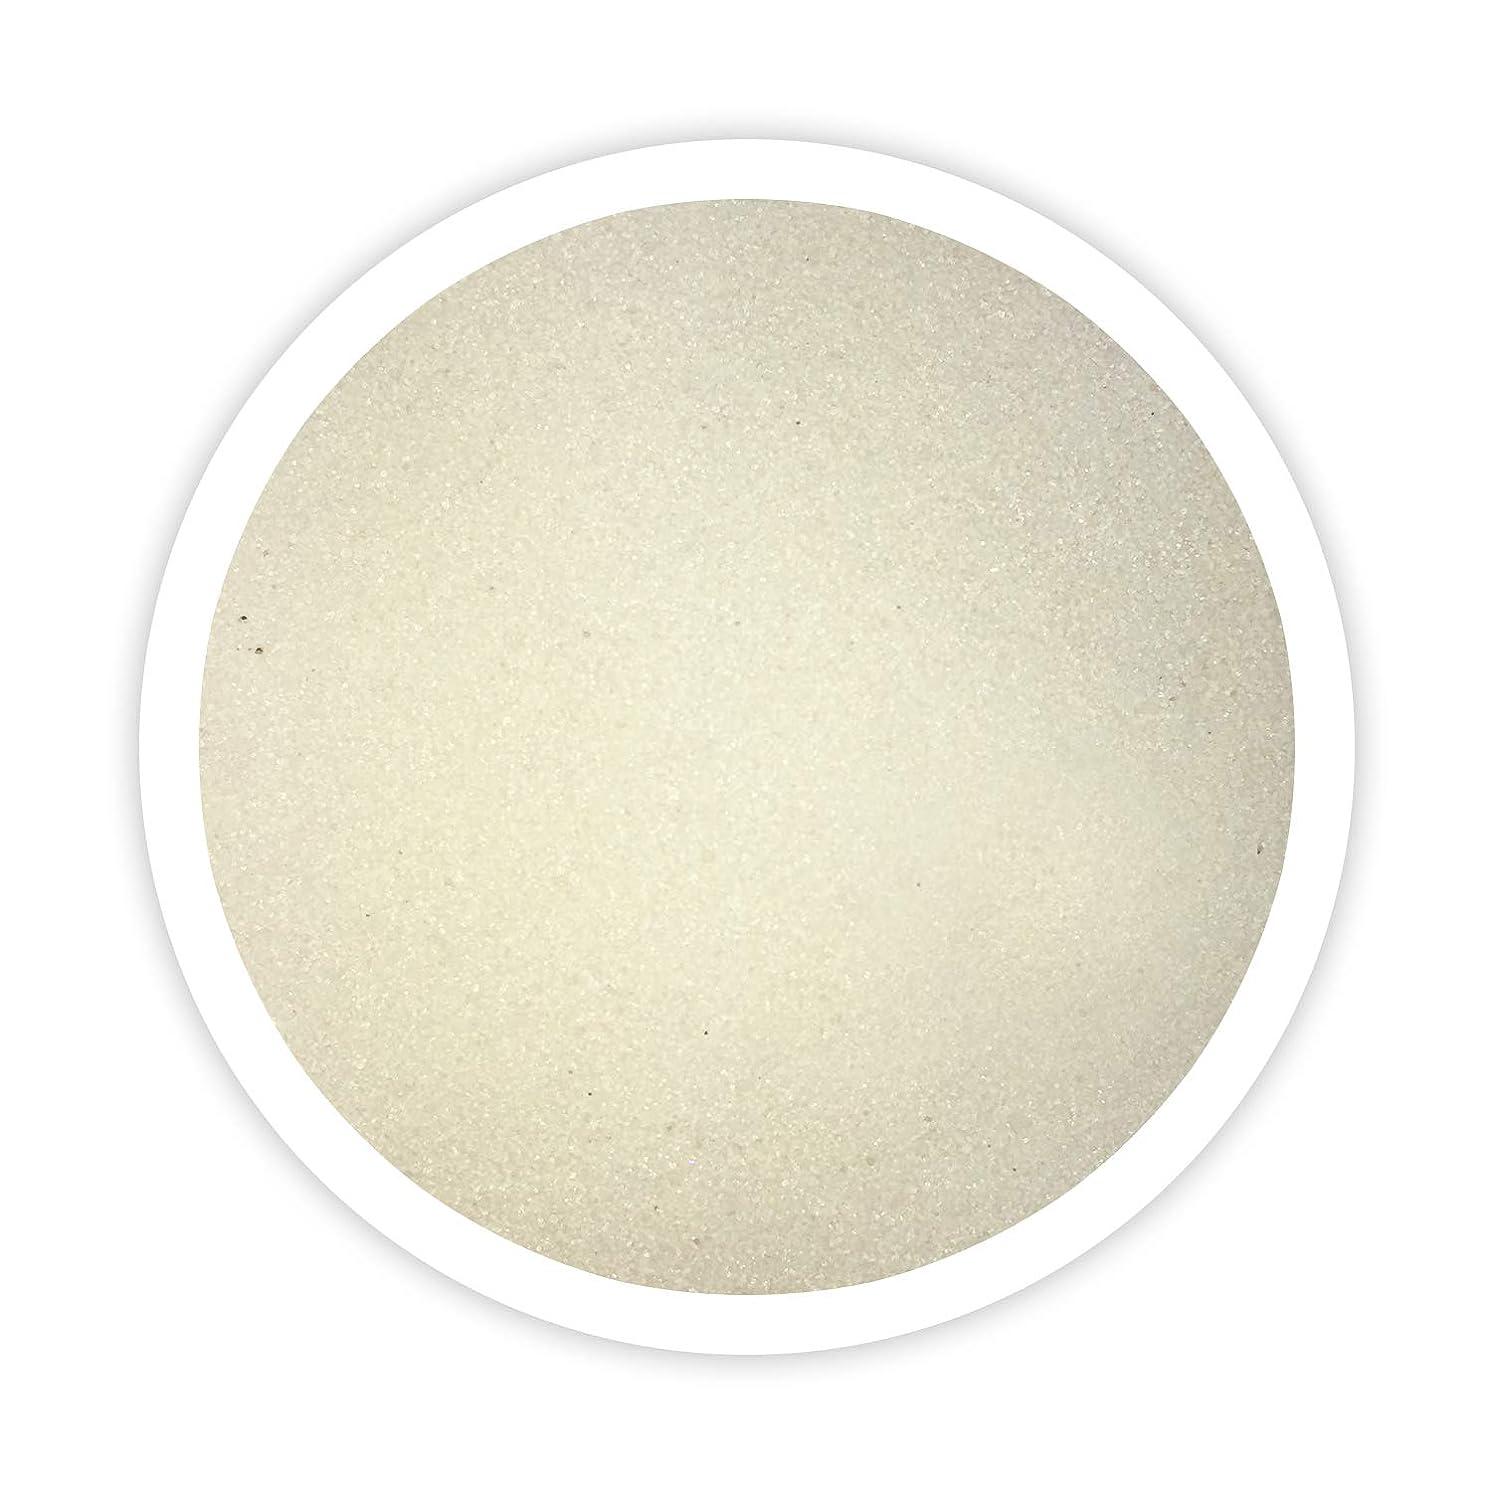 Sandsational Ivory (Butter) Unity Sand~1.5 lbs (22oz), Cream Colored Sand for Weddings, Vase Filler, Home Décor, Craft Sand